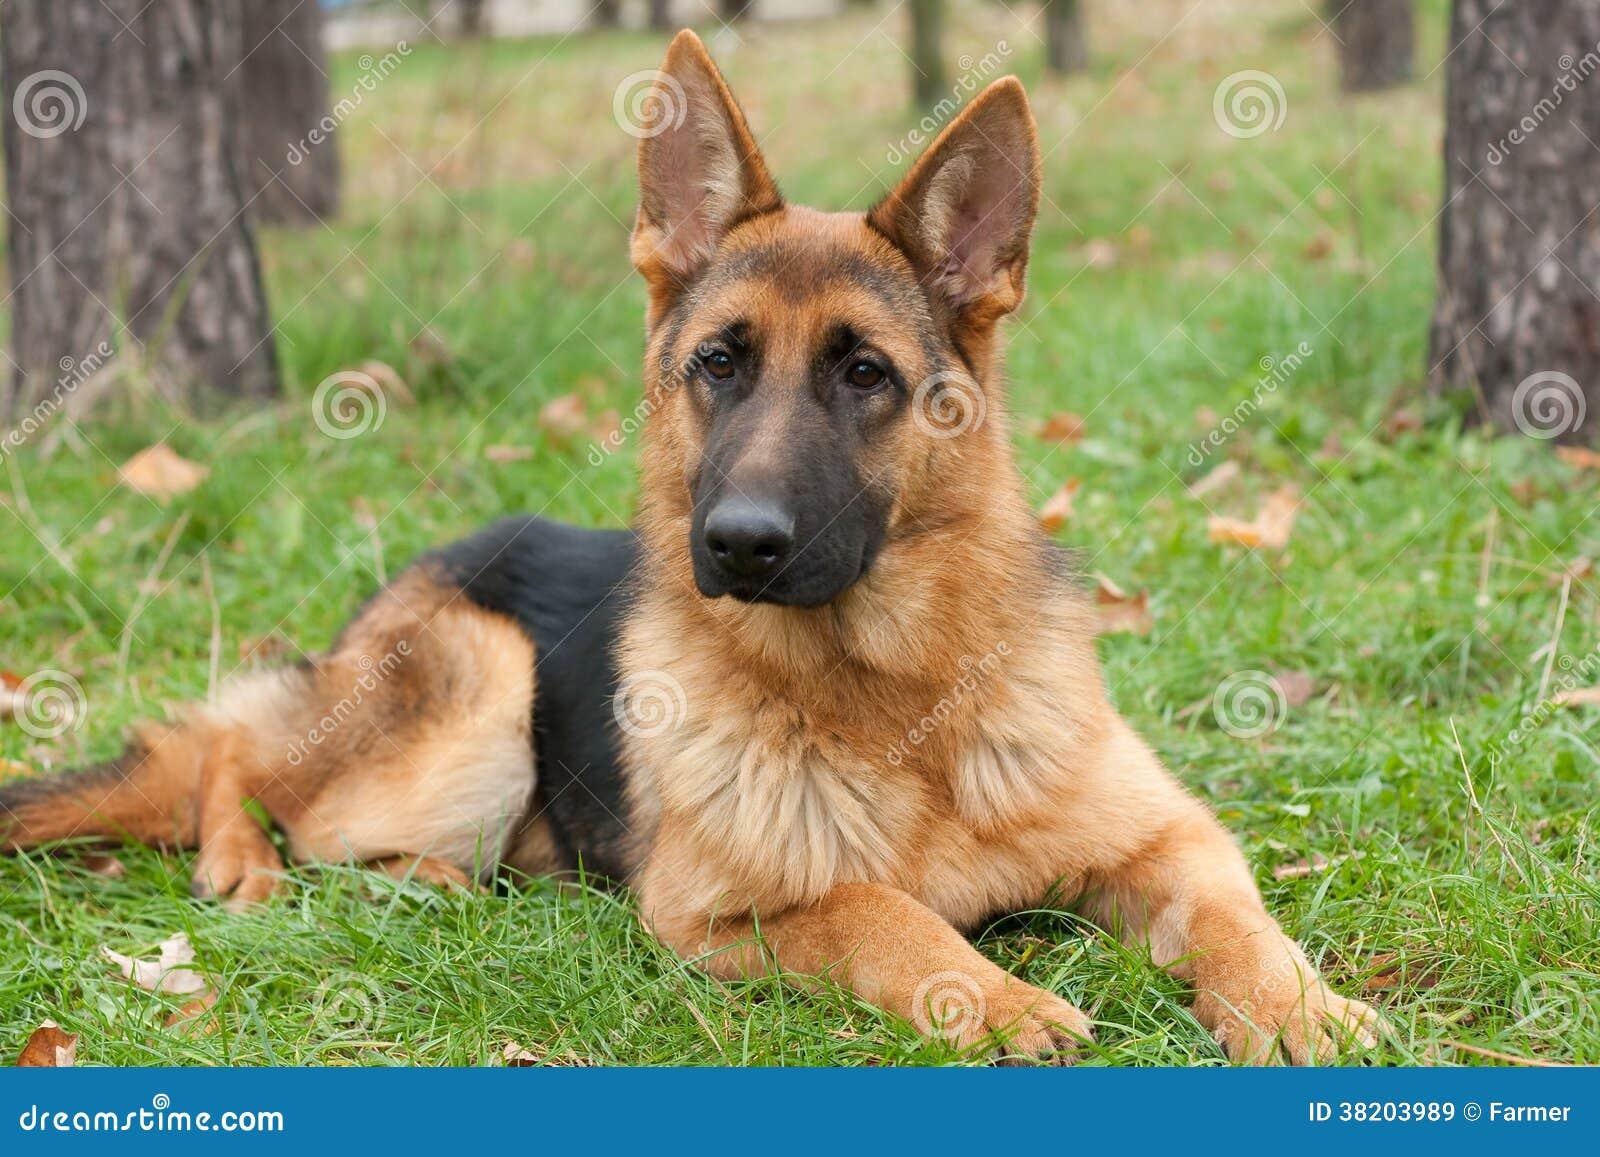 German Shepherd Dog Stock Image Image Of German Security 38203989